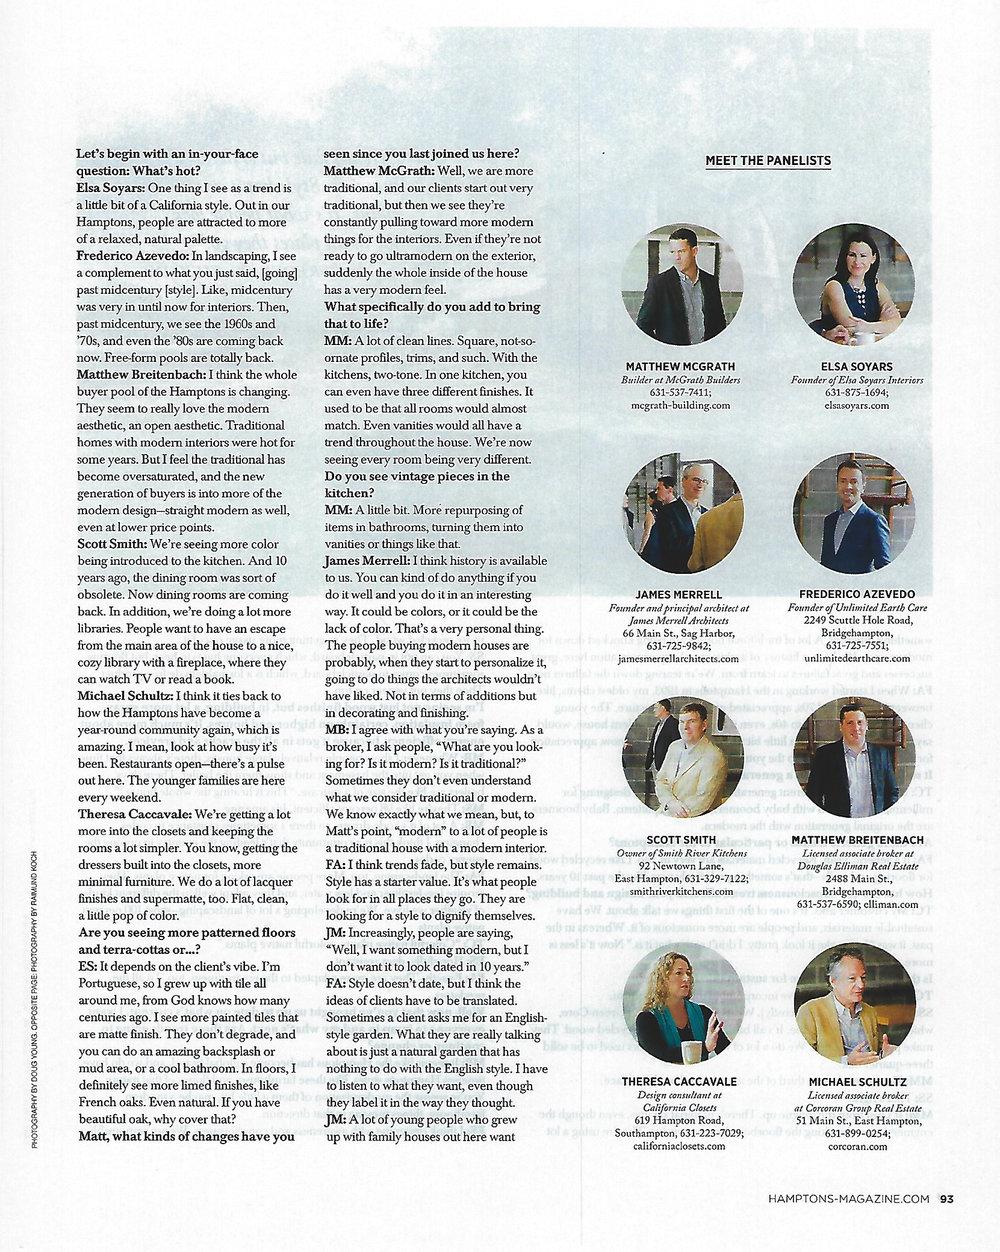 Hamptons Magazine - Modern Times_June 2017_2.jpg